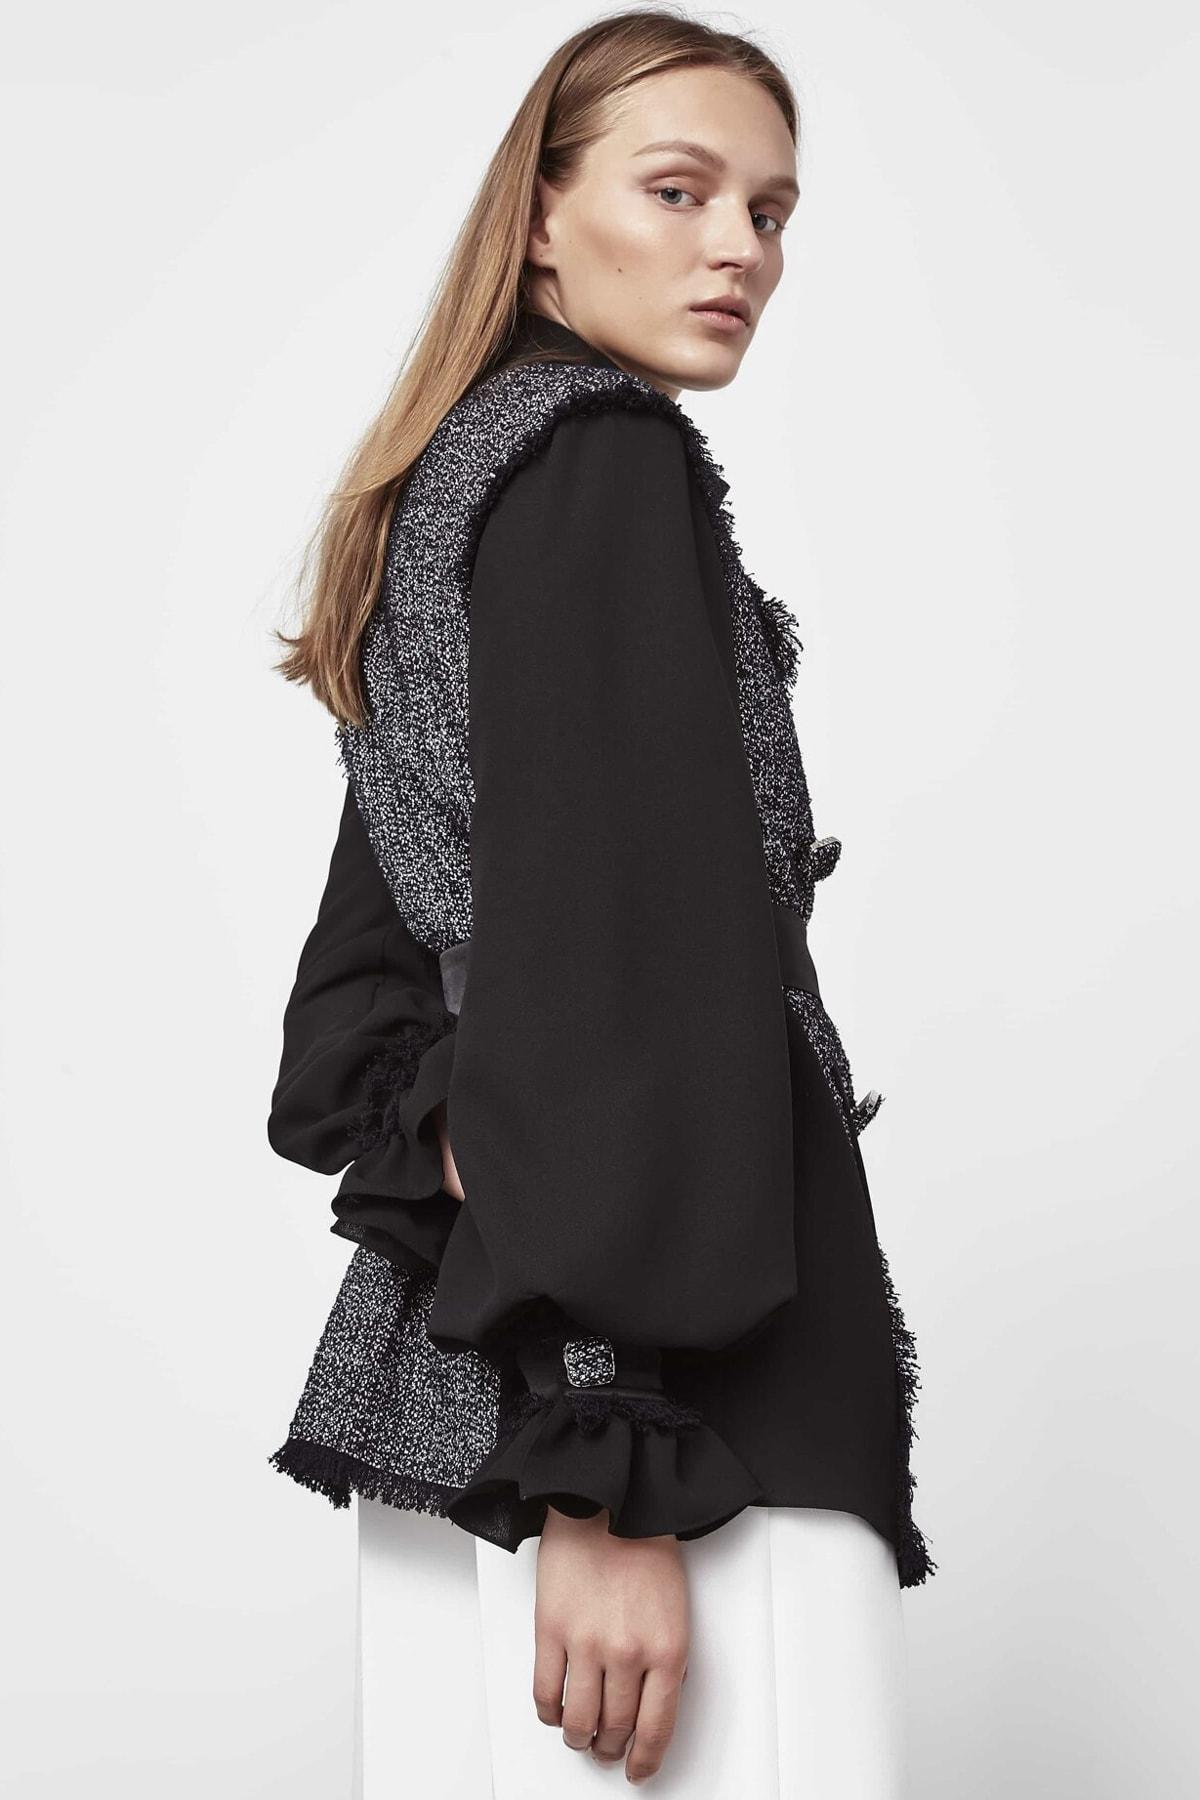 İpekyol Kadın Siyah Tüvit Mixli Ceket IW6190005188001 2